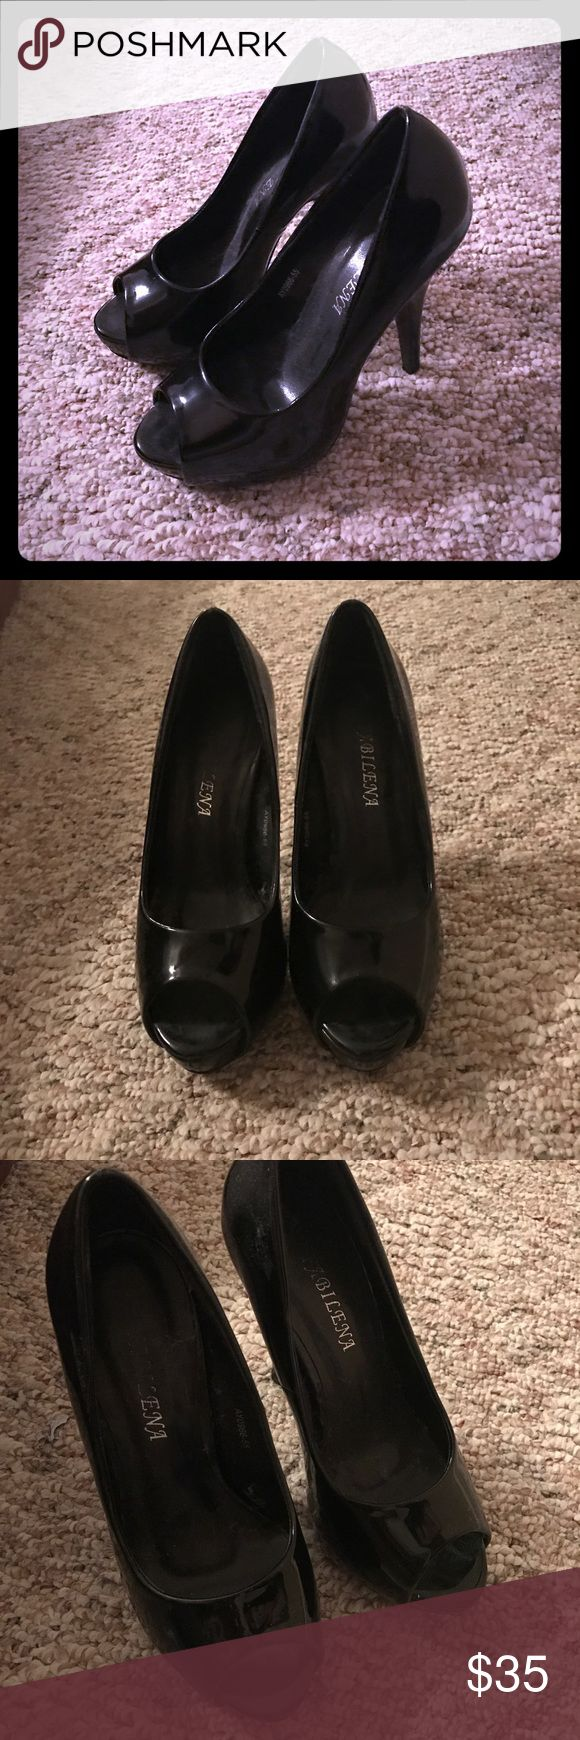 Black peep toe pumps Never worn black patent leather peep toe pumps Shoes Heels